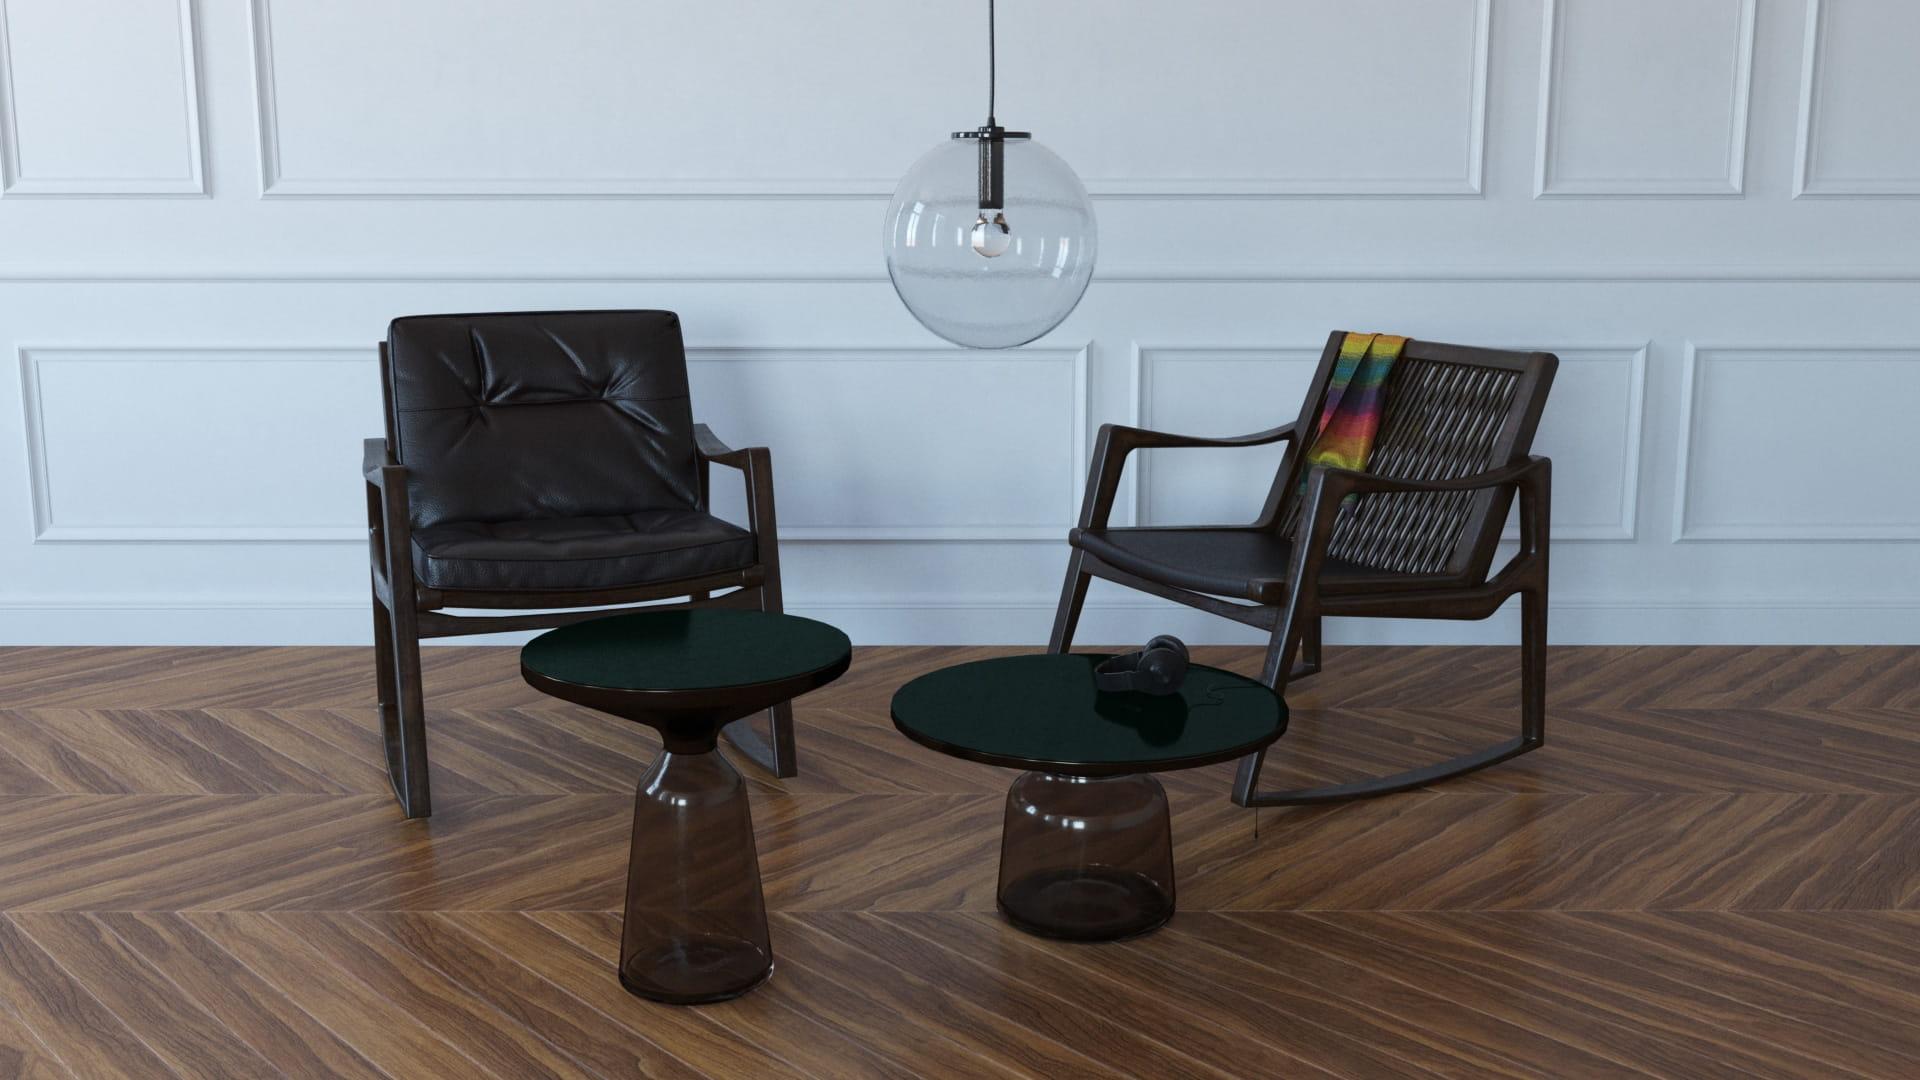 furniture set 26 AM253